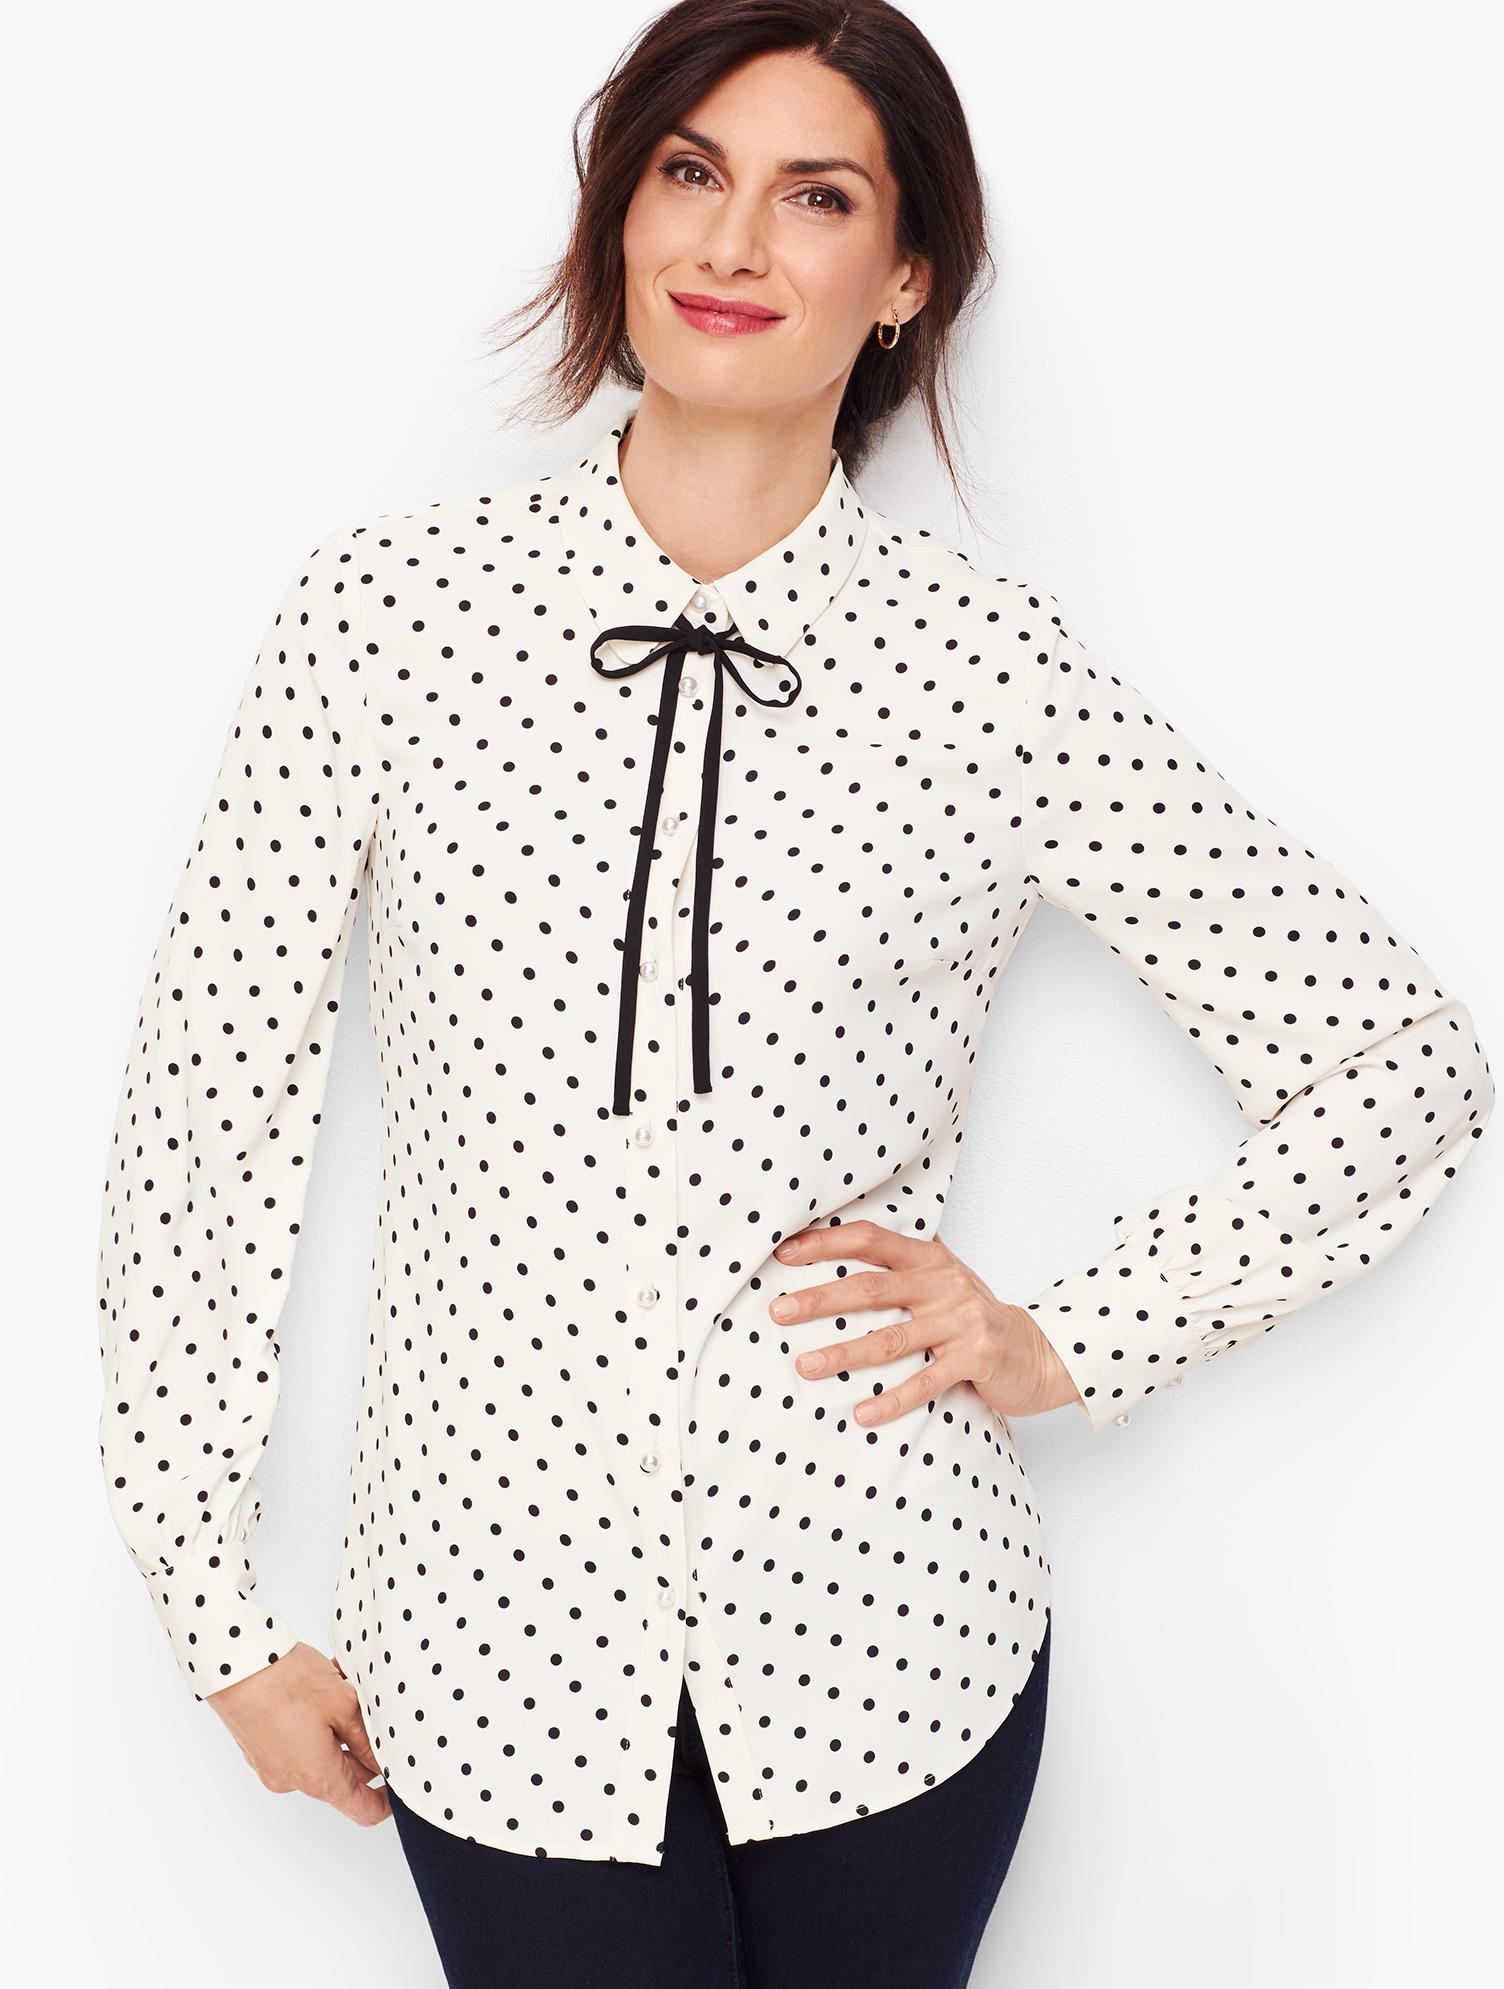 60s Shirts, T-shirt, Blouses, Hippie Shirts Pearl Button Dot Shirt - IVORYBLACK - XL - Talbots $69.99 AT vintagedancer.com